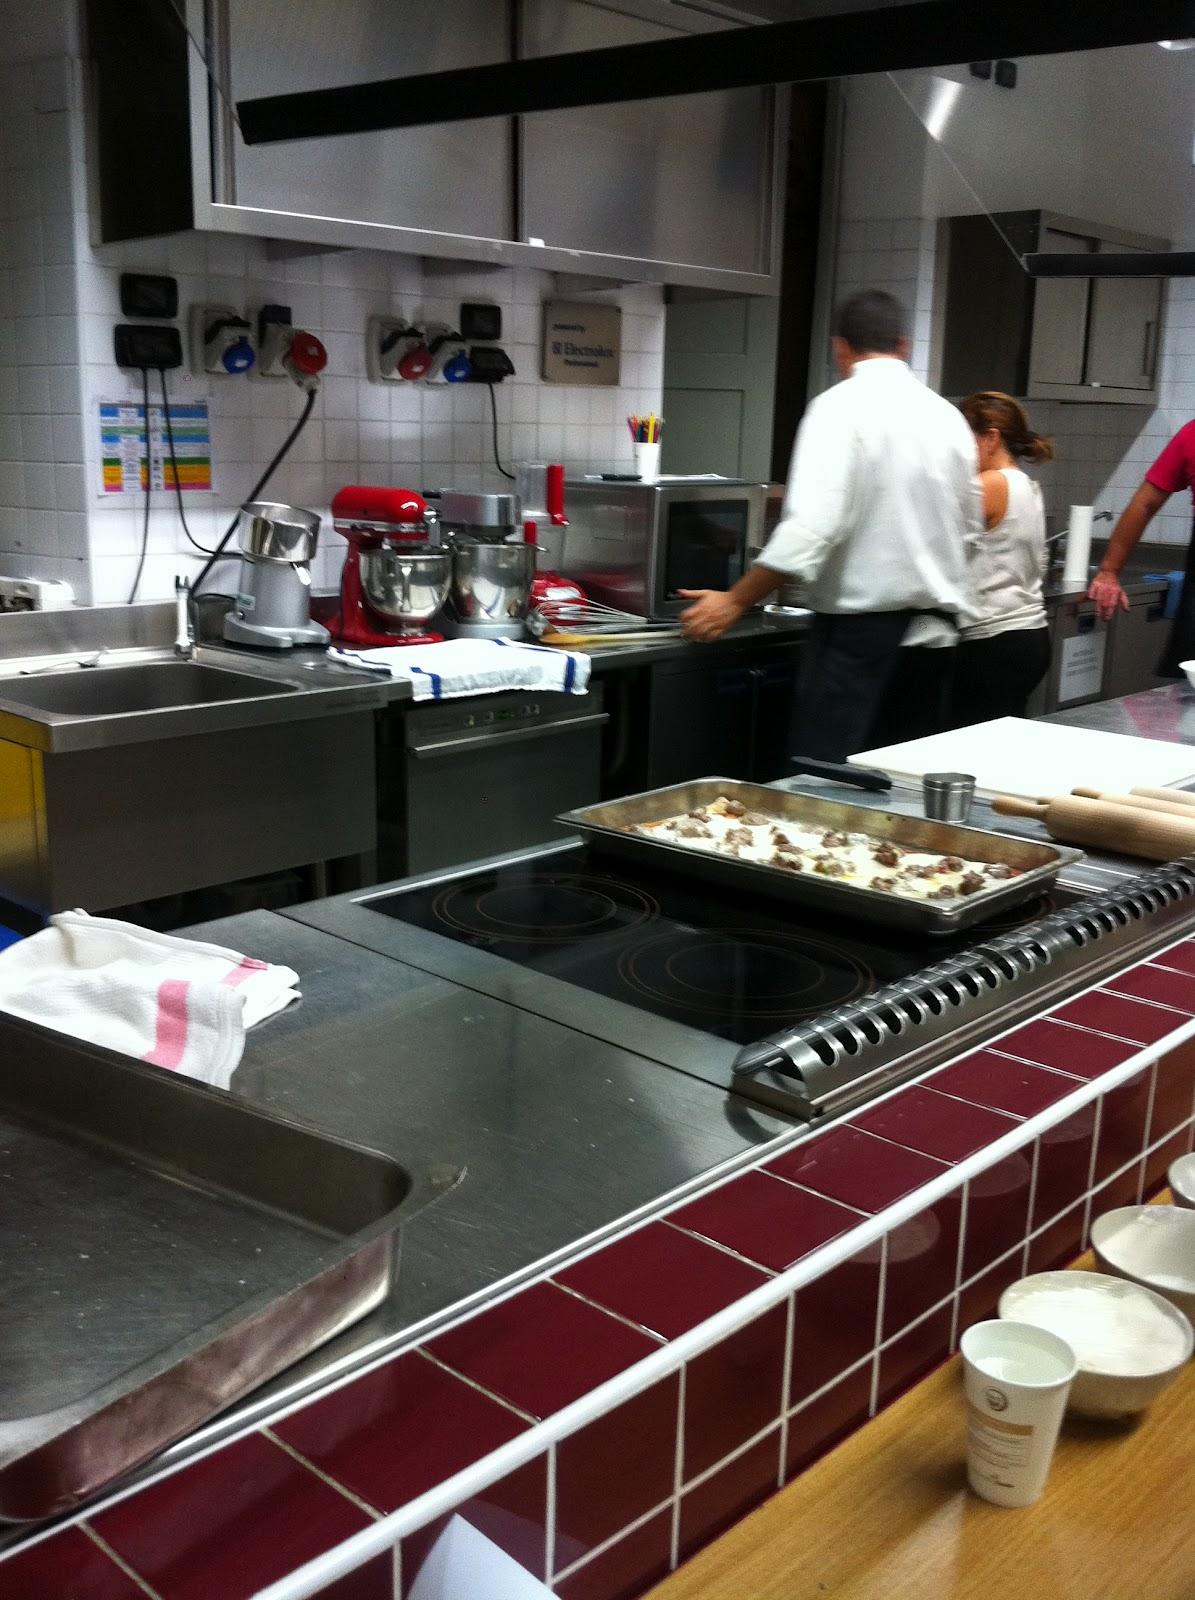 Langhuorino corsi di cucina da eataly torino corso - Corsi di cucina genova ...